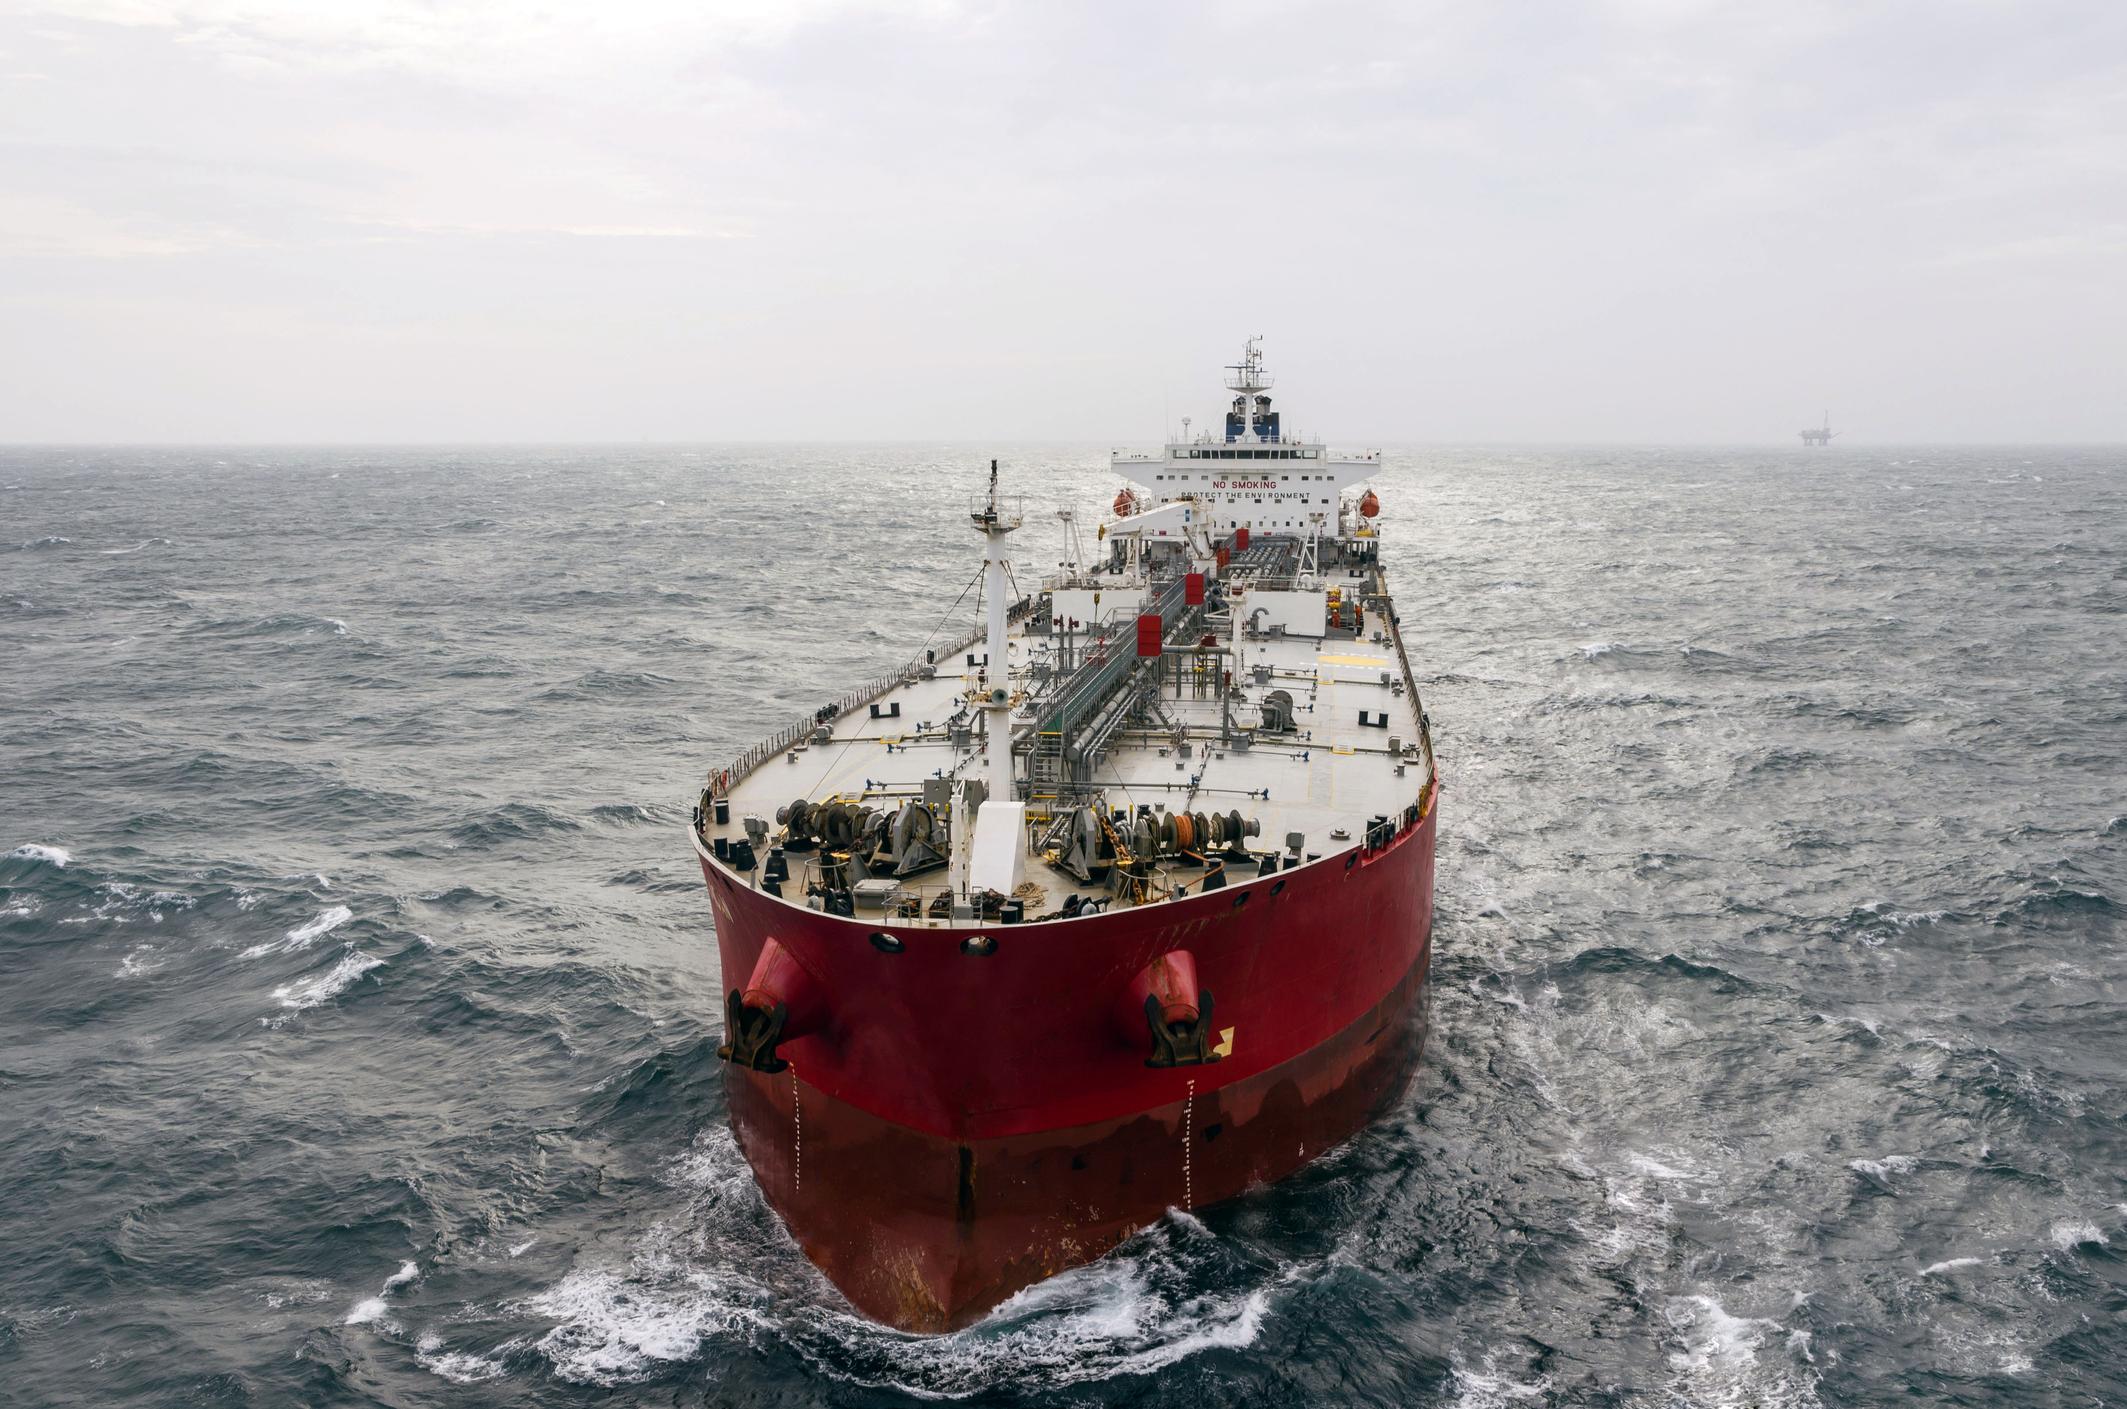 A large oil tanker in open water